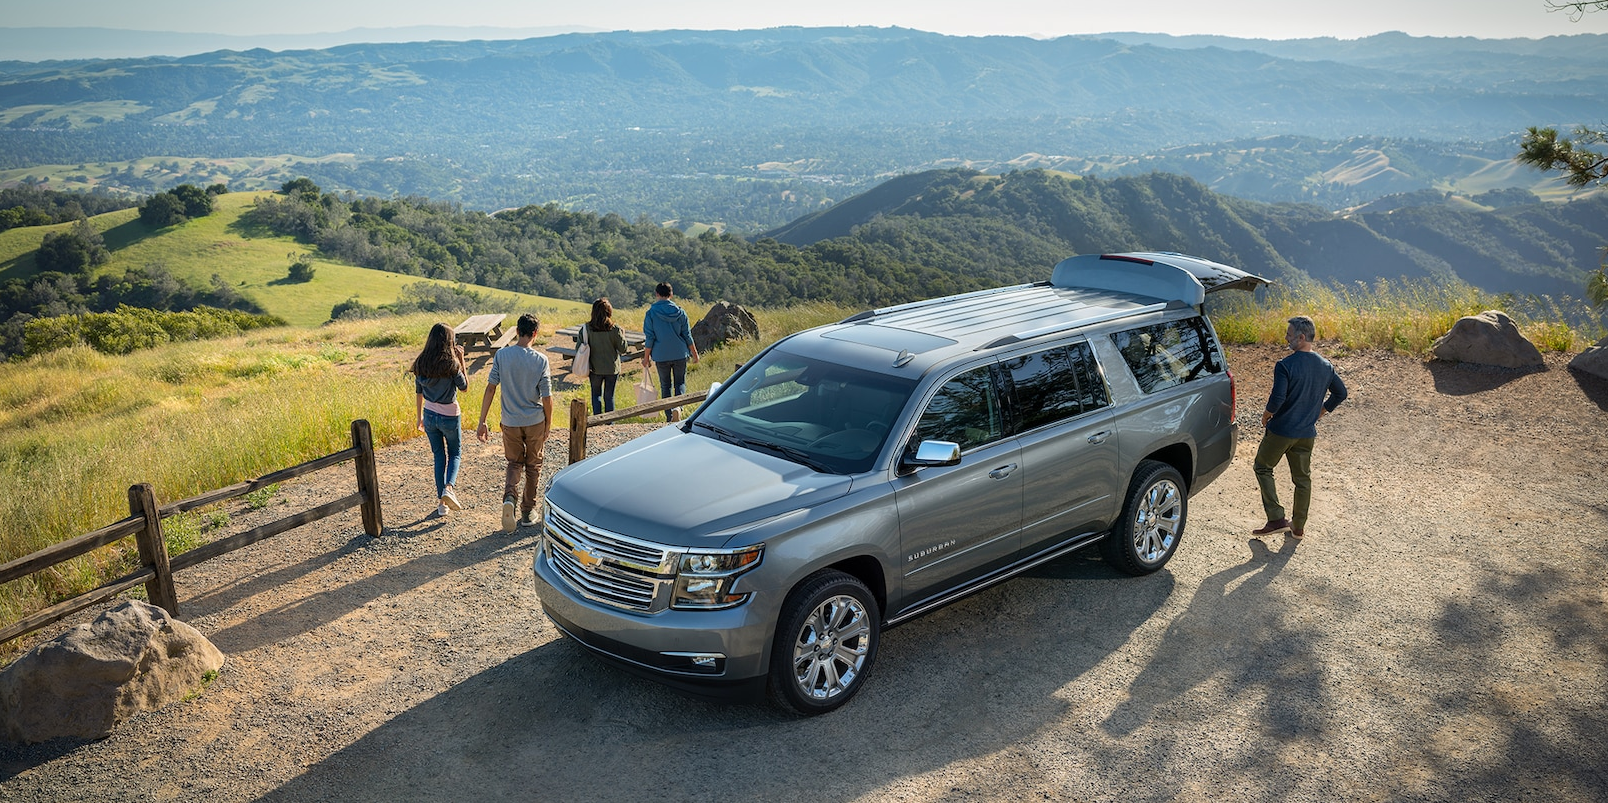 Ford Expedition Vs. Chevy Suburban: Big-SUV Slugfest